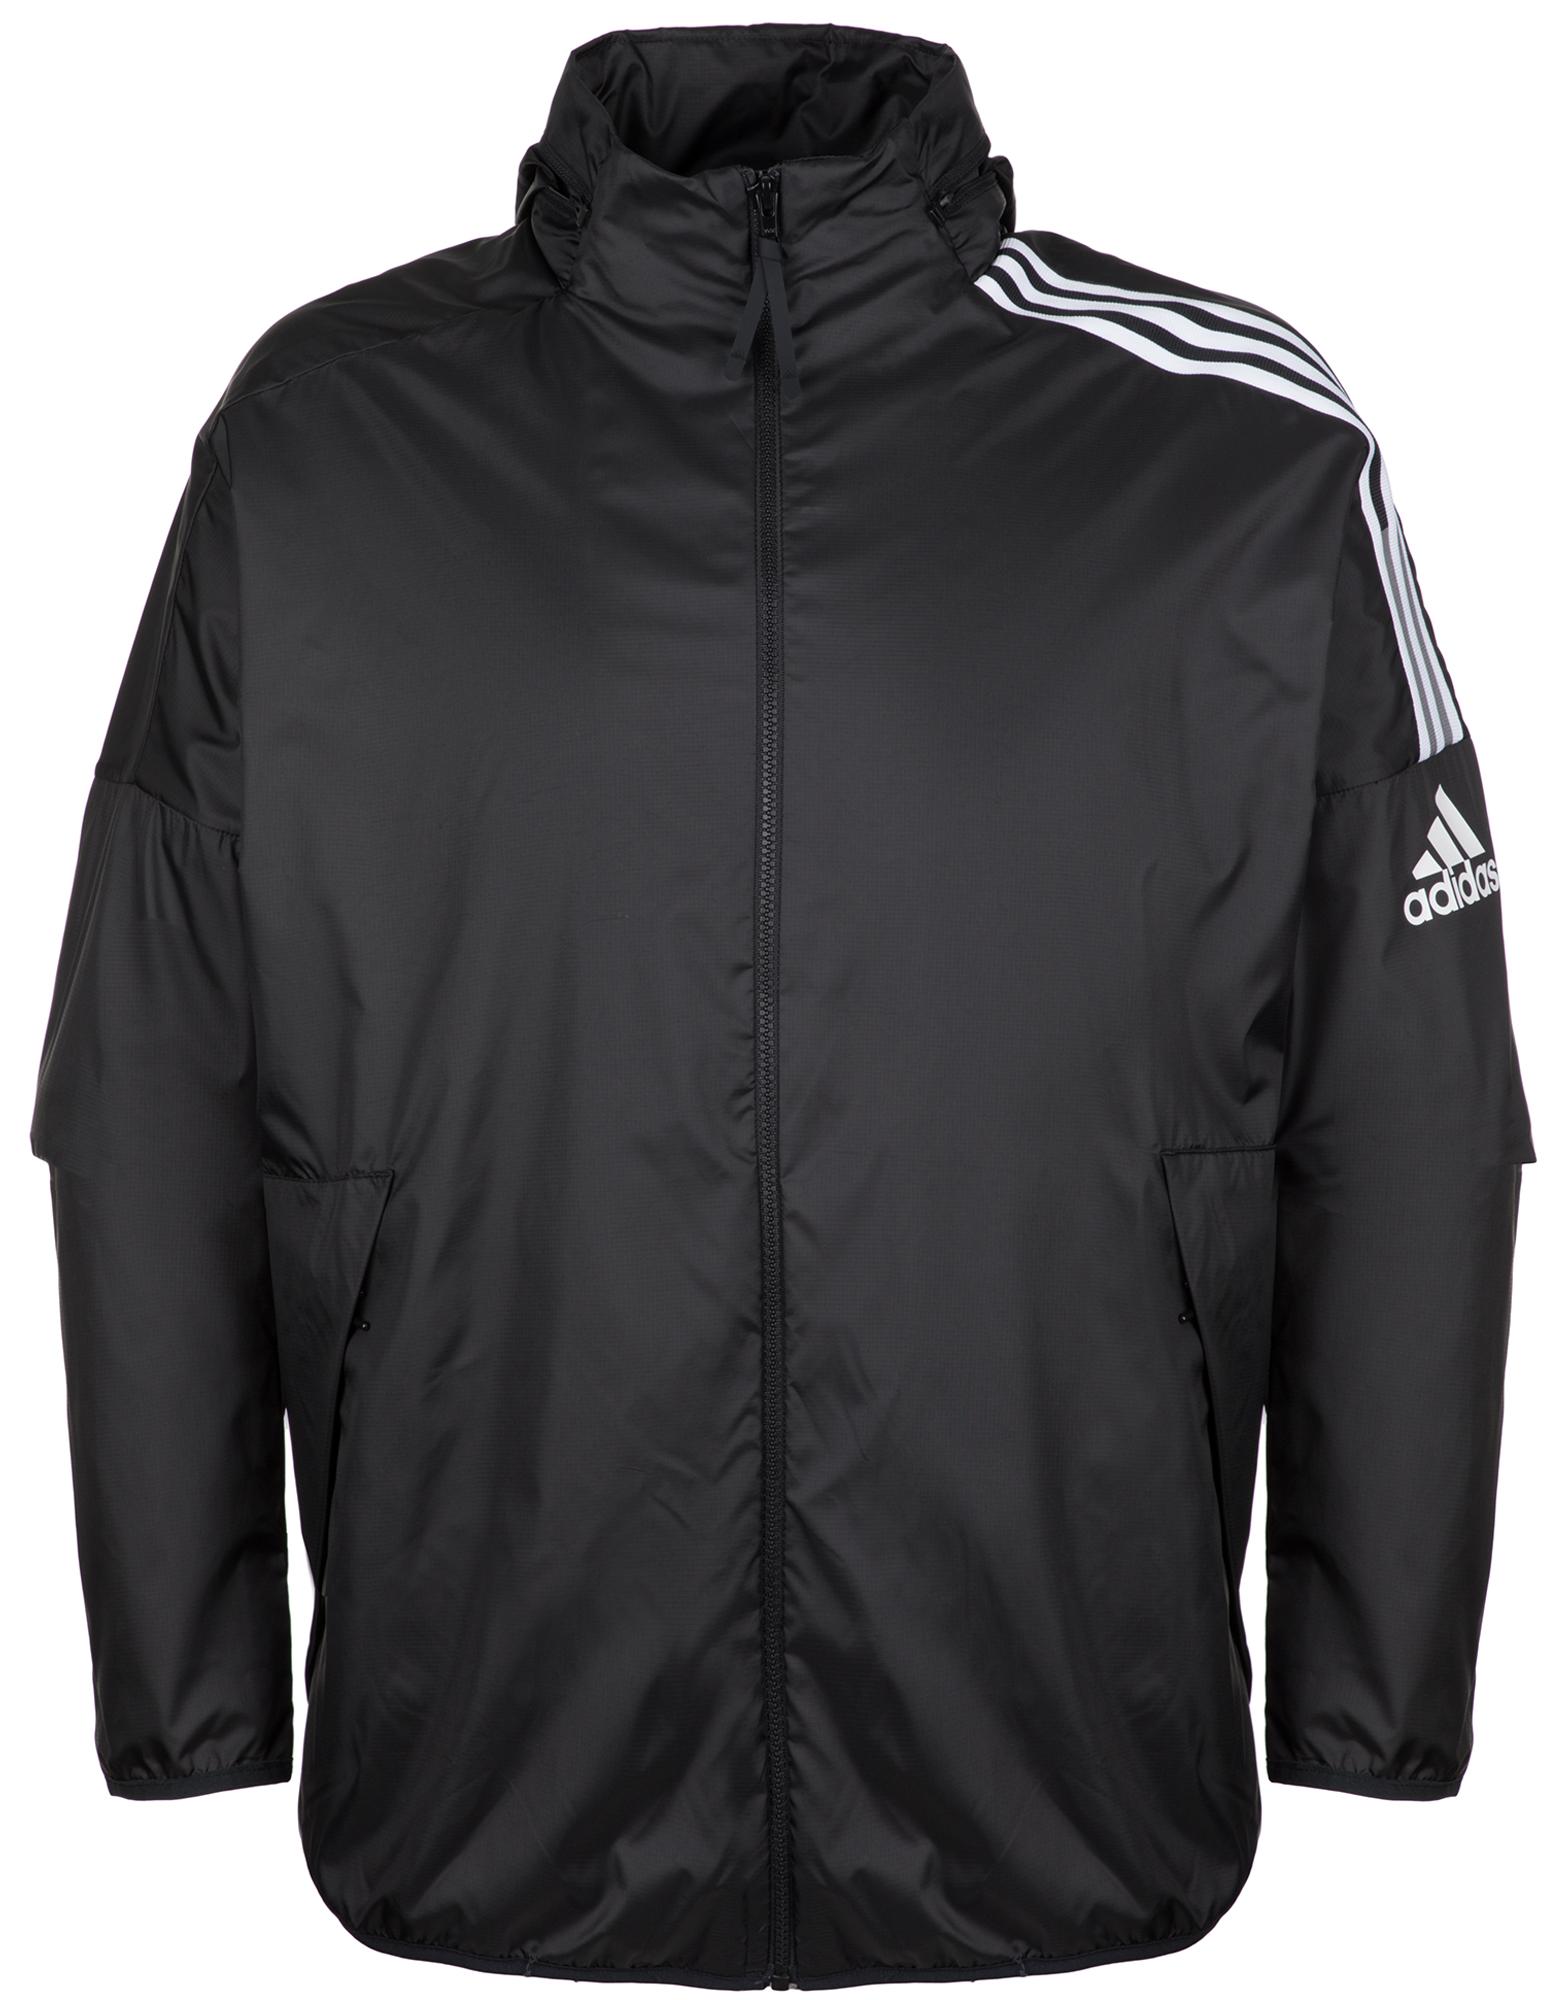 Adidas Ветровка мужская Adidas Z.N.E., размер 52-54